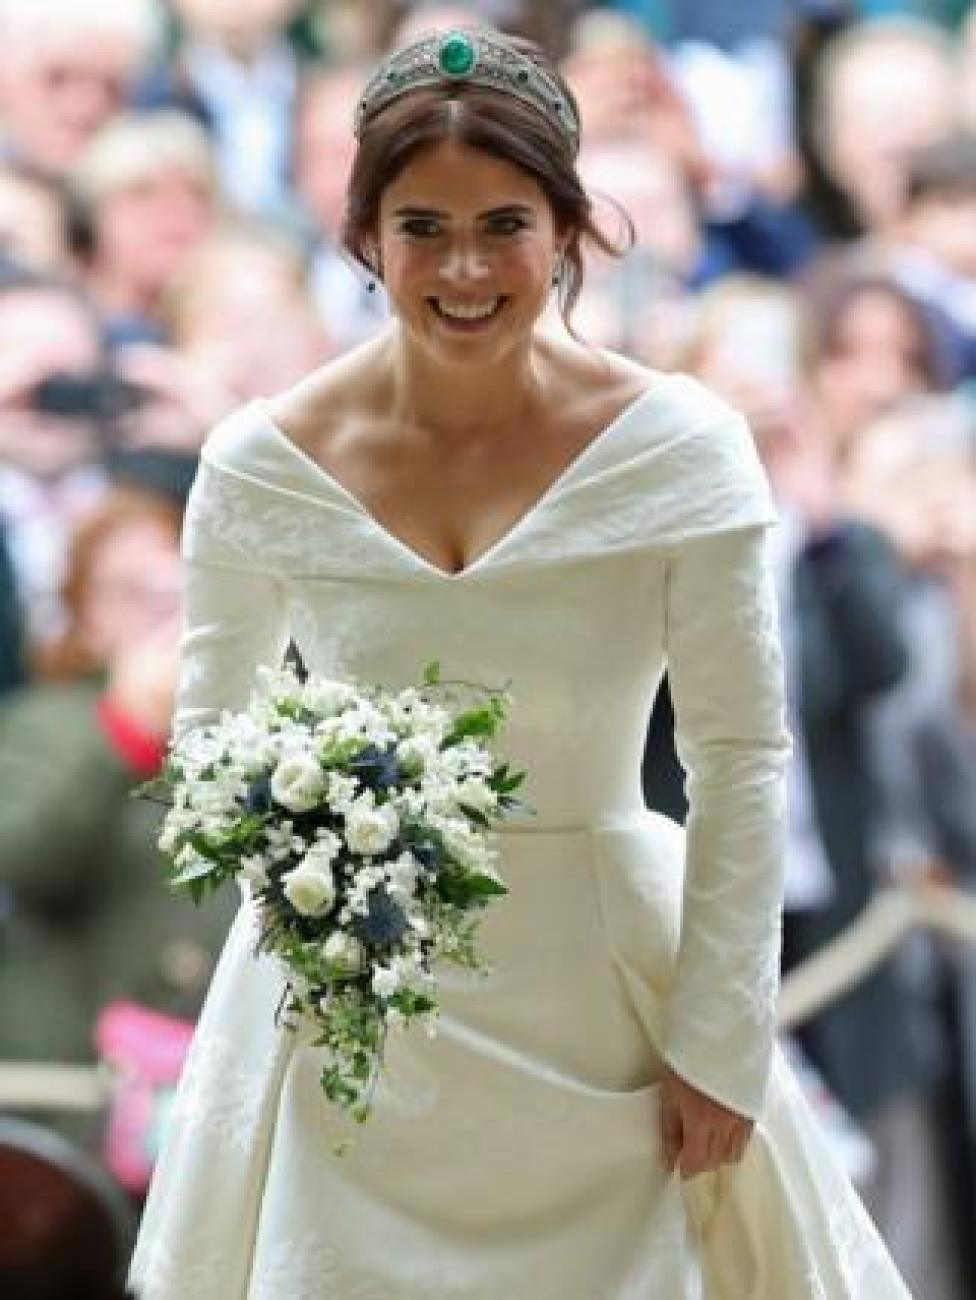 NEWS Princess Eugenie arrives for her wedding